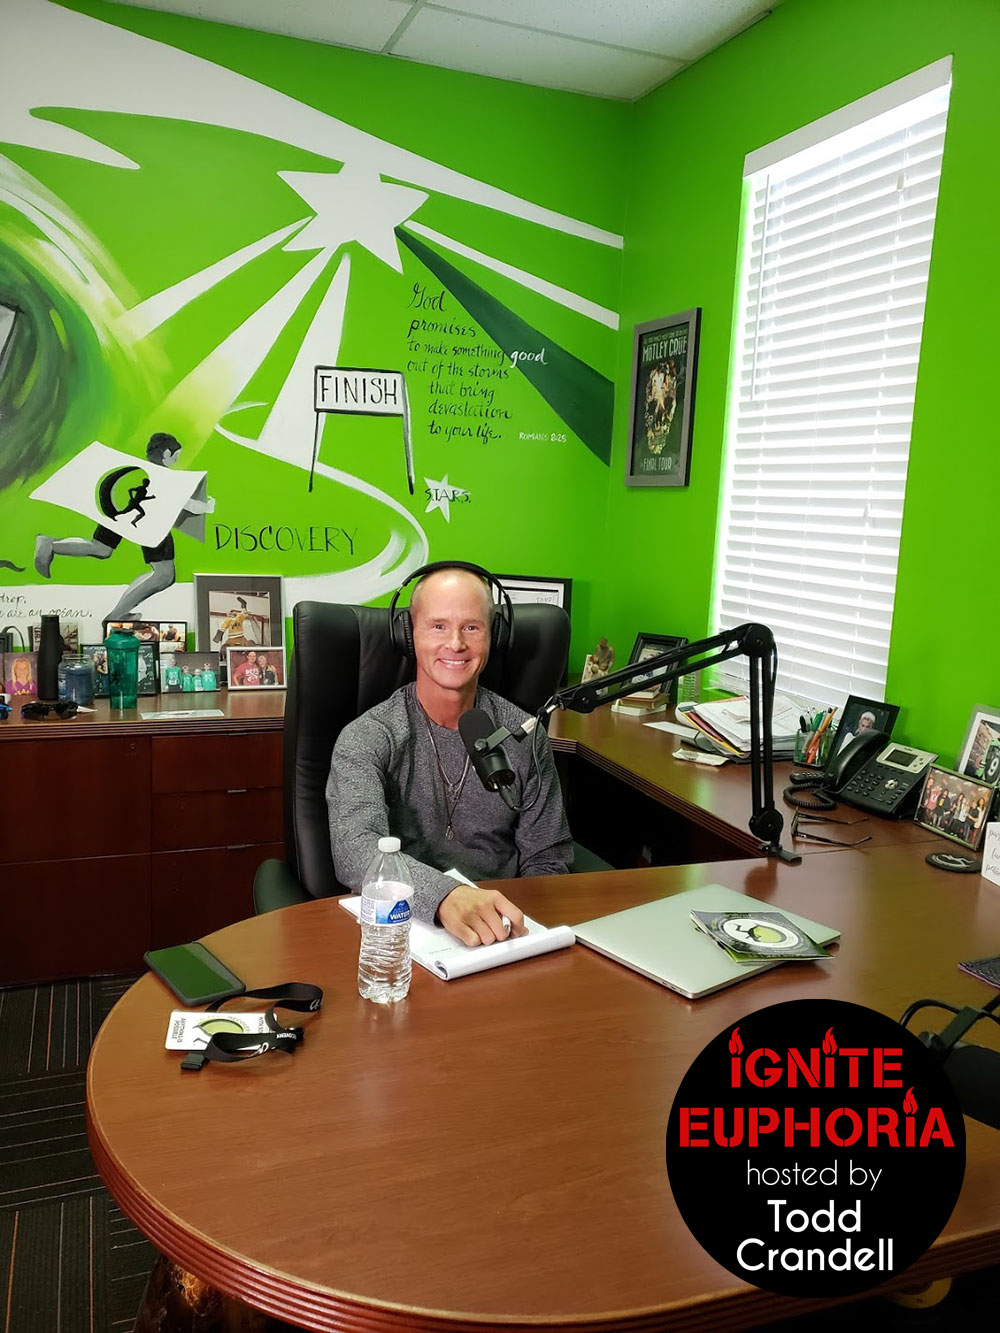 Ignite Euphoria Podcast Desk